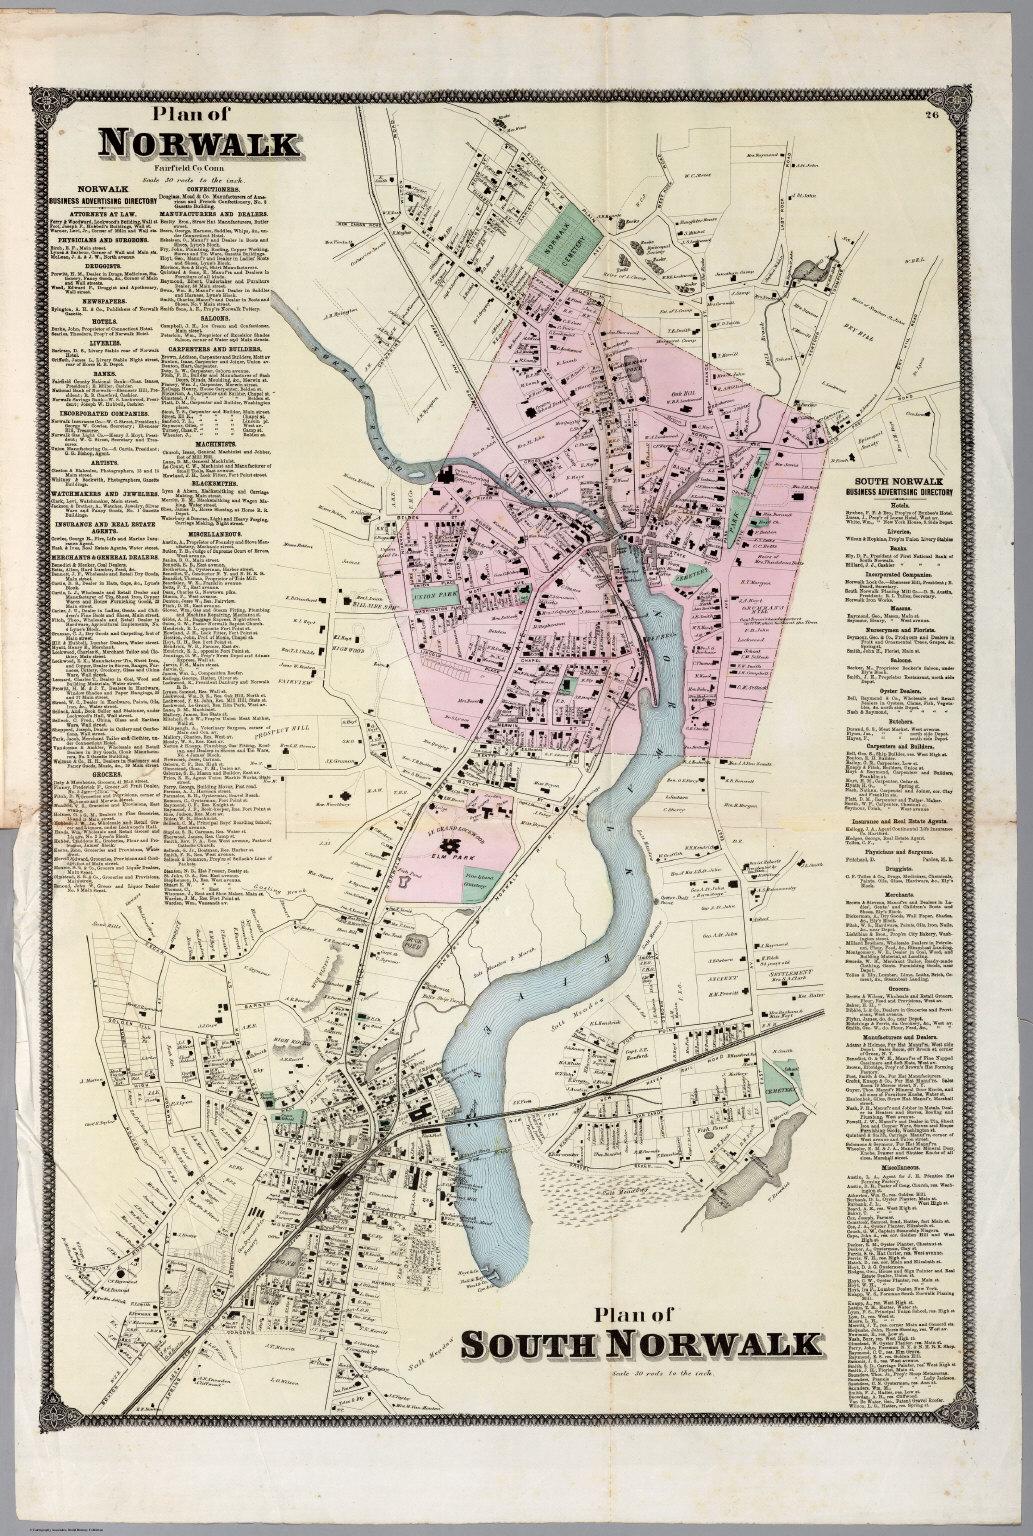 Plan of Norwalk, Plan of South Norwalk, Connecticut. - David Rumsey ...